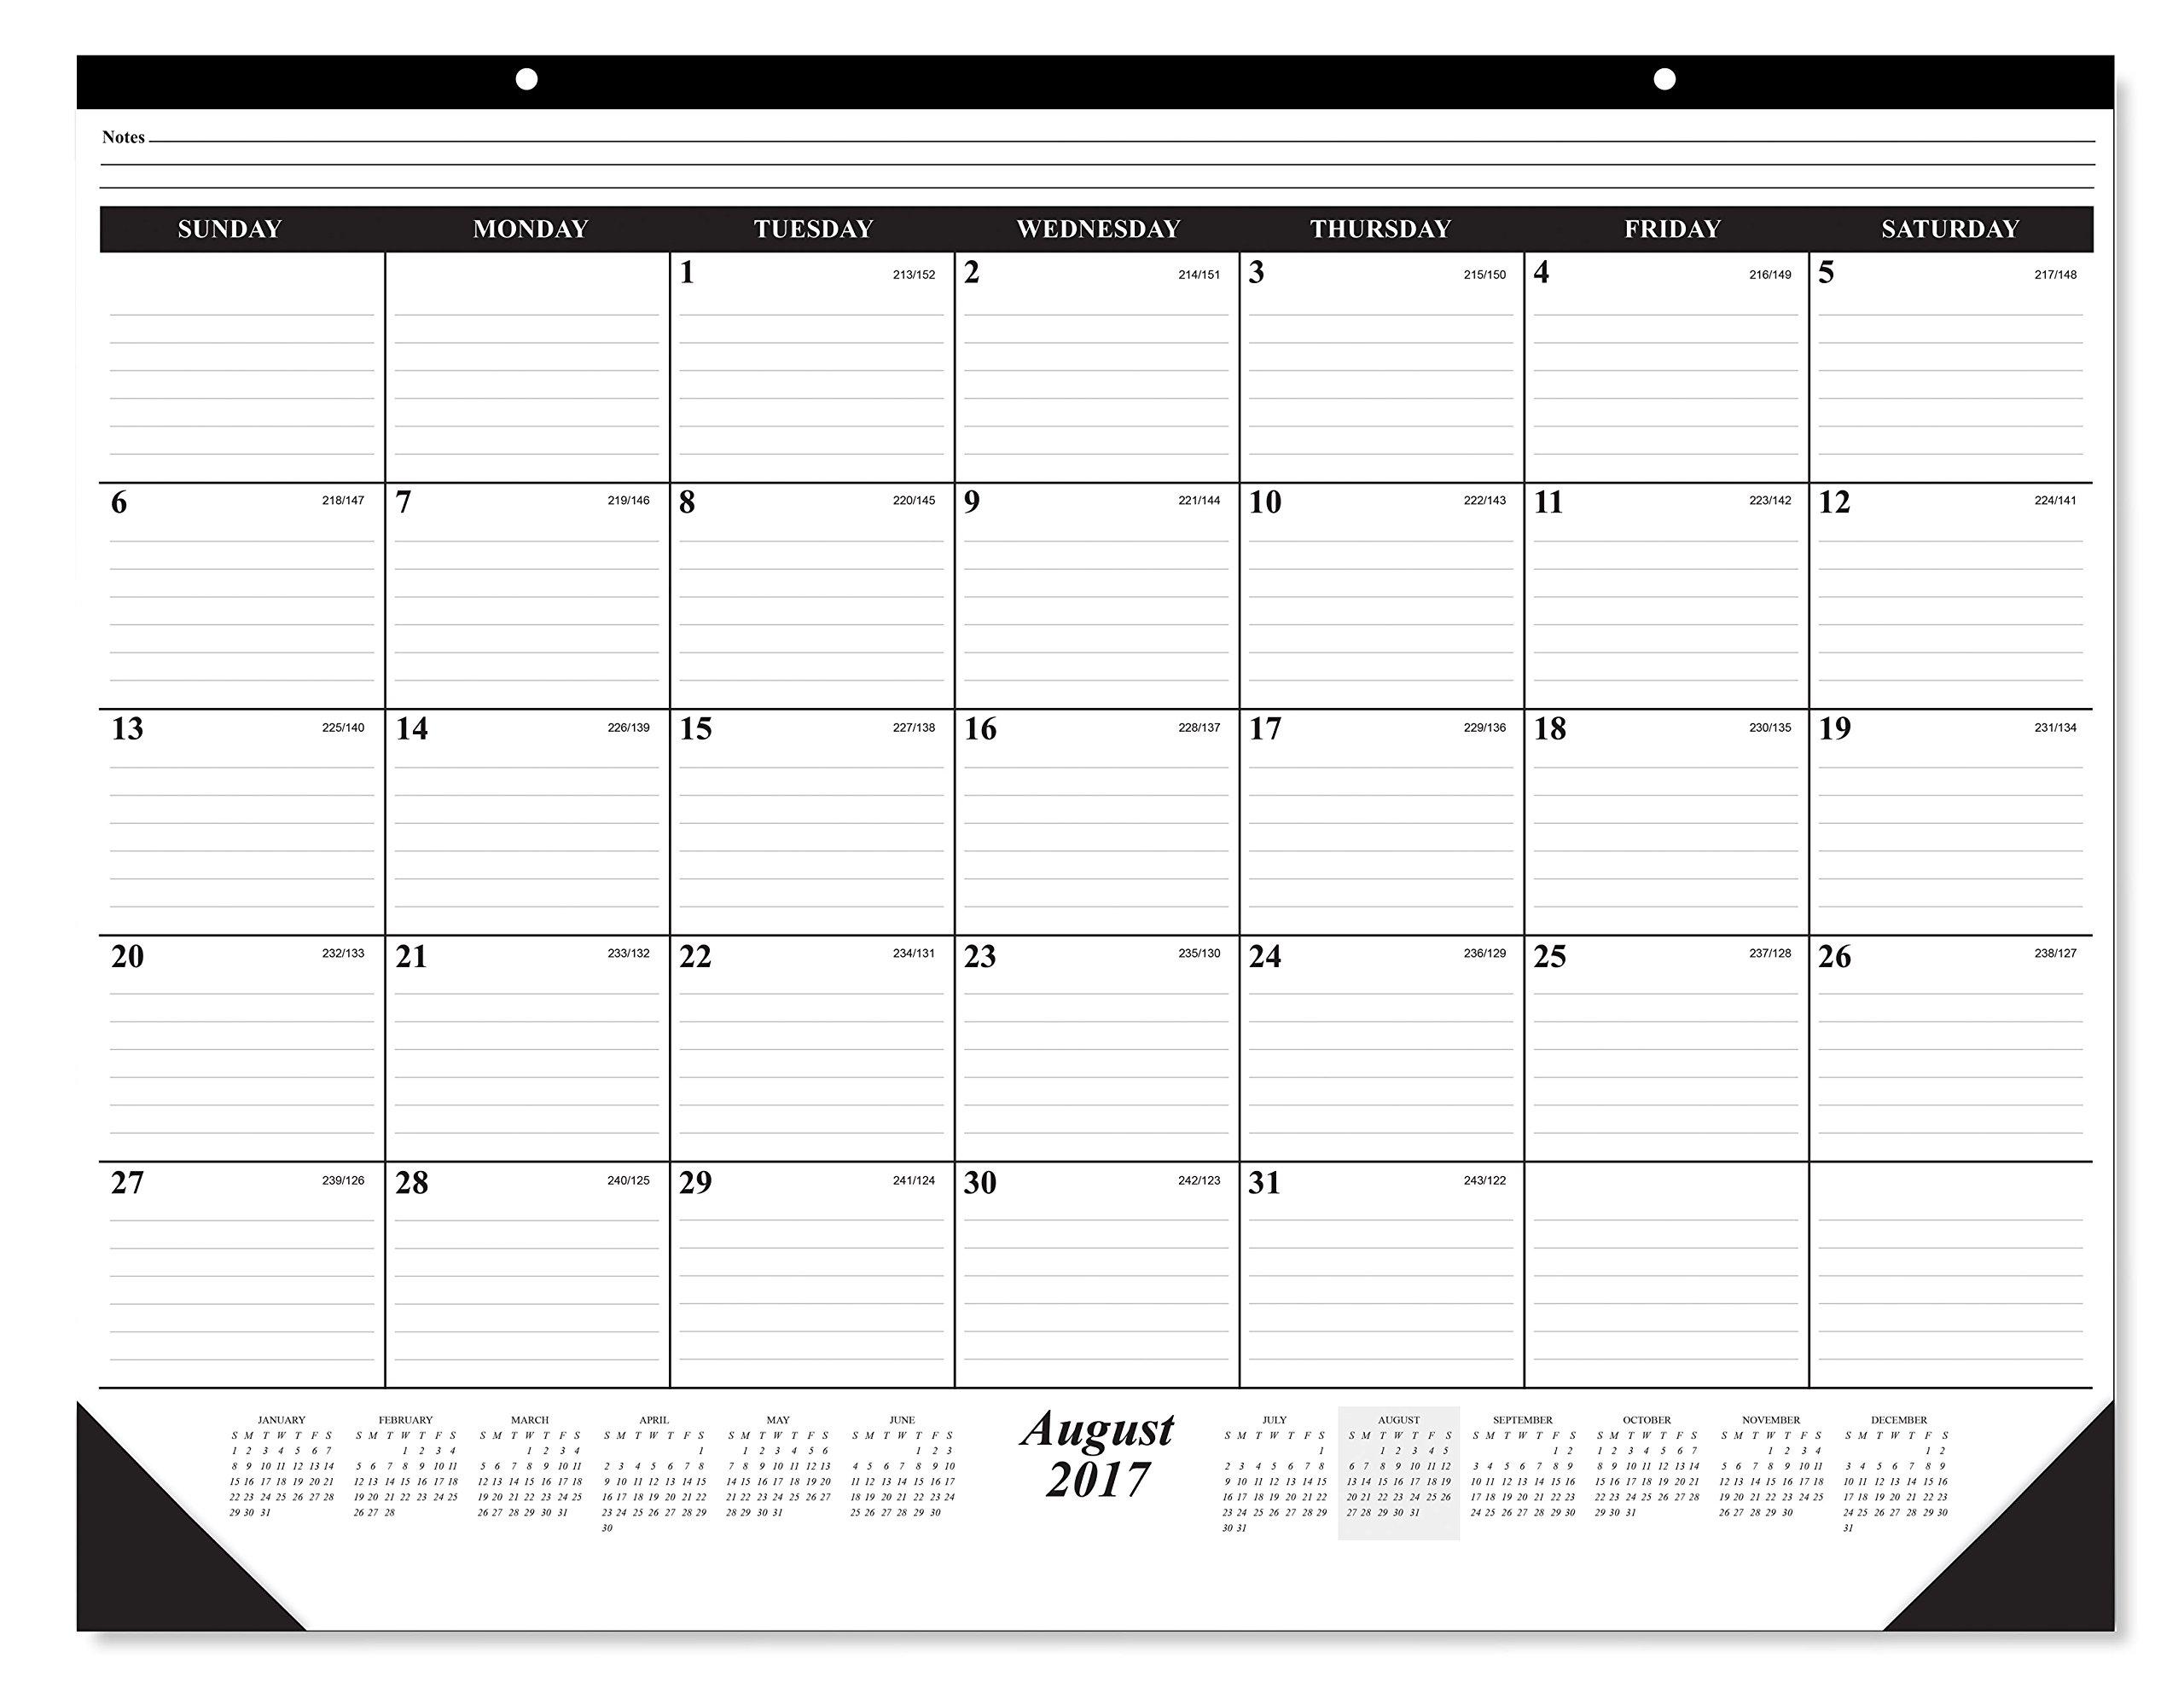 Catch Julian Calendar July 11 2019 ⋆ The Best Printable